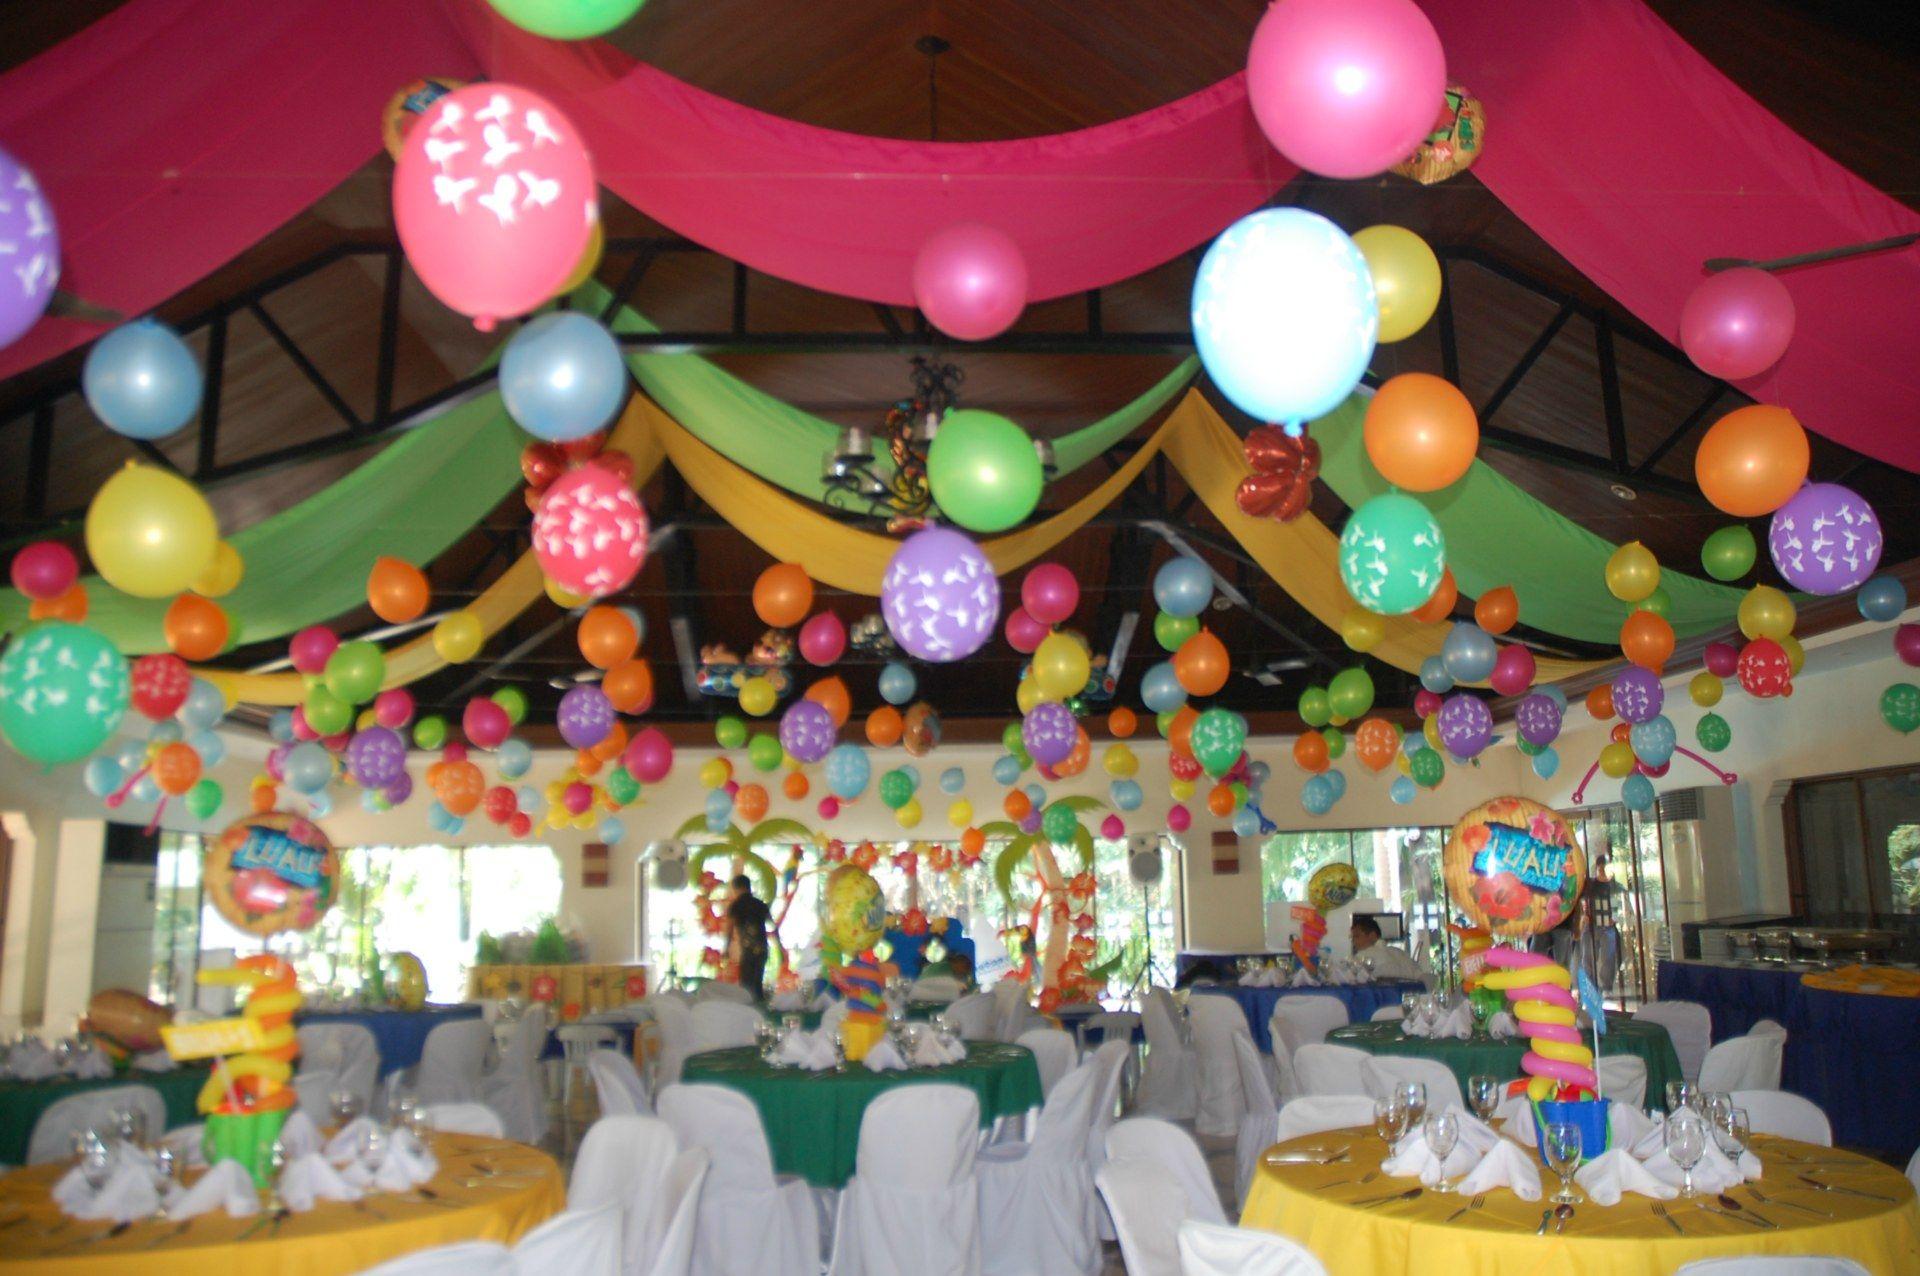 birthday organizer indore entertainment balloon birthday parties fiestas birthday celebrations anniversary parties balloons